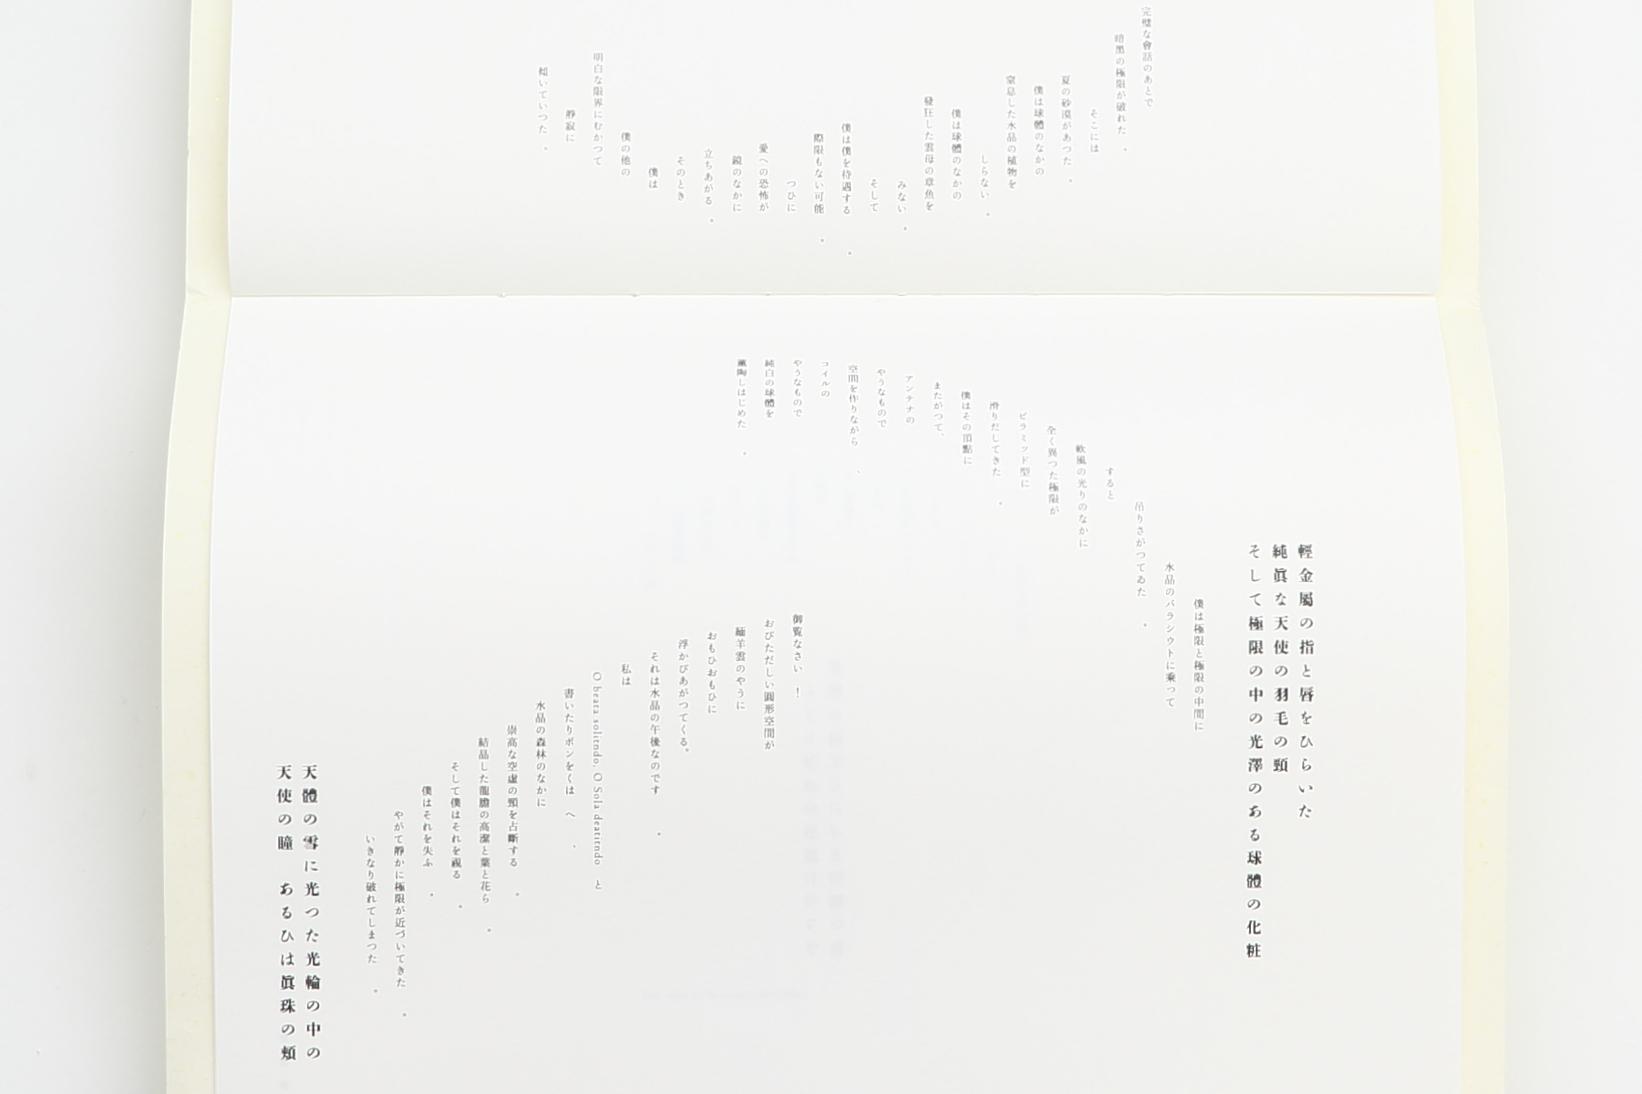 m215_01のコピー.jpg